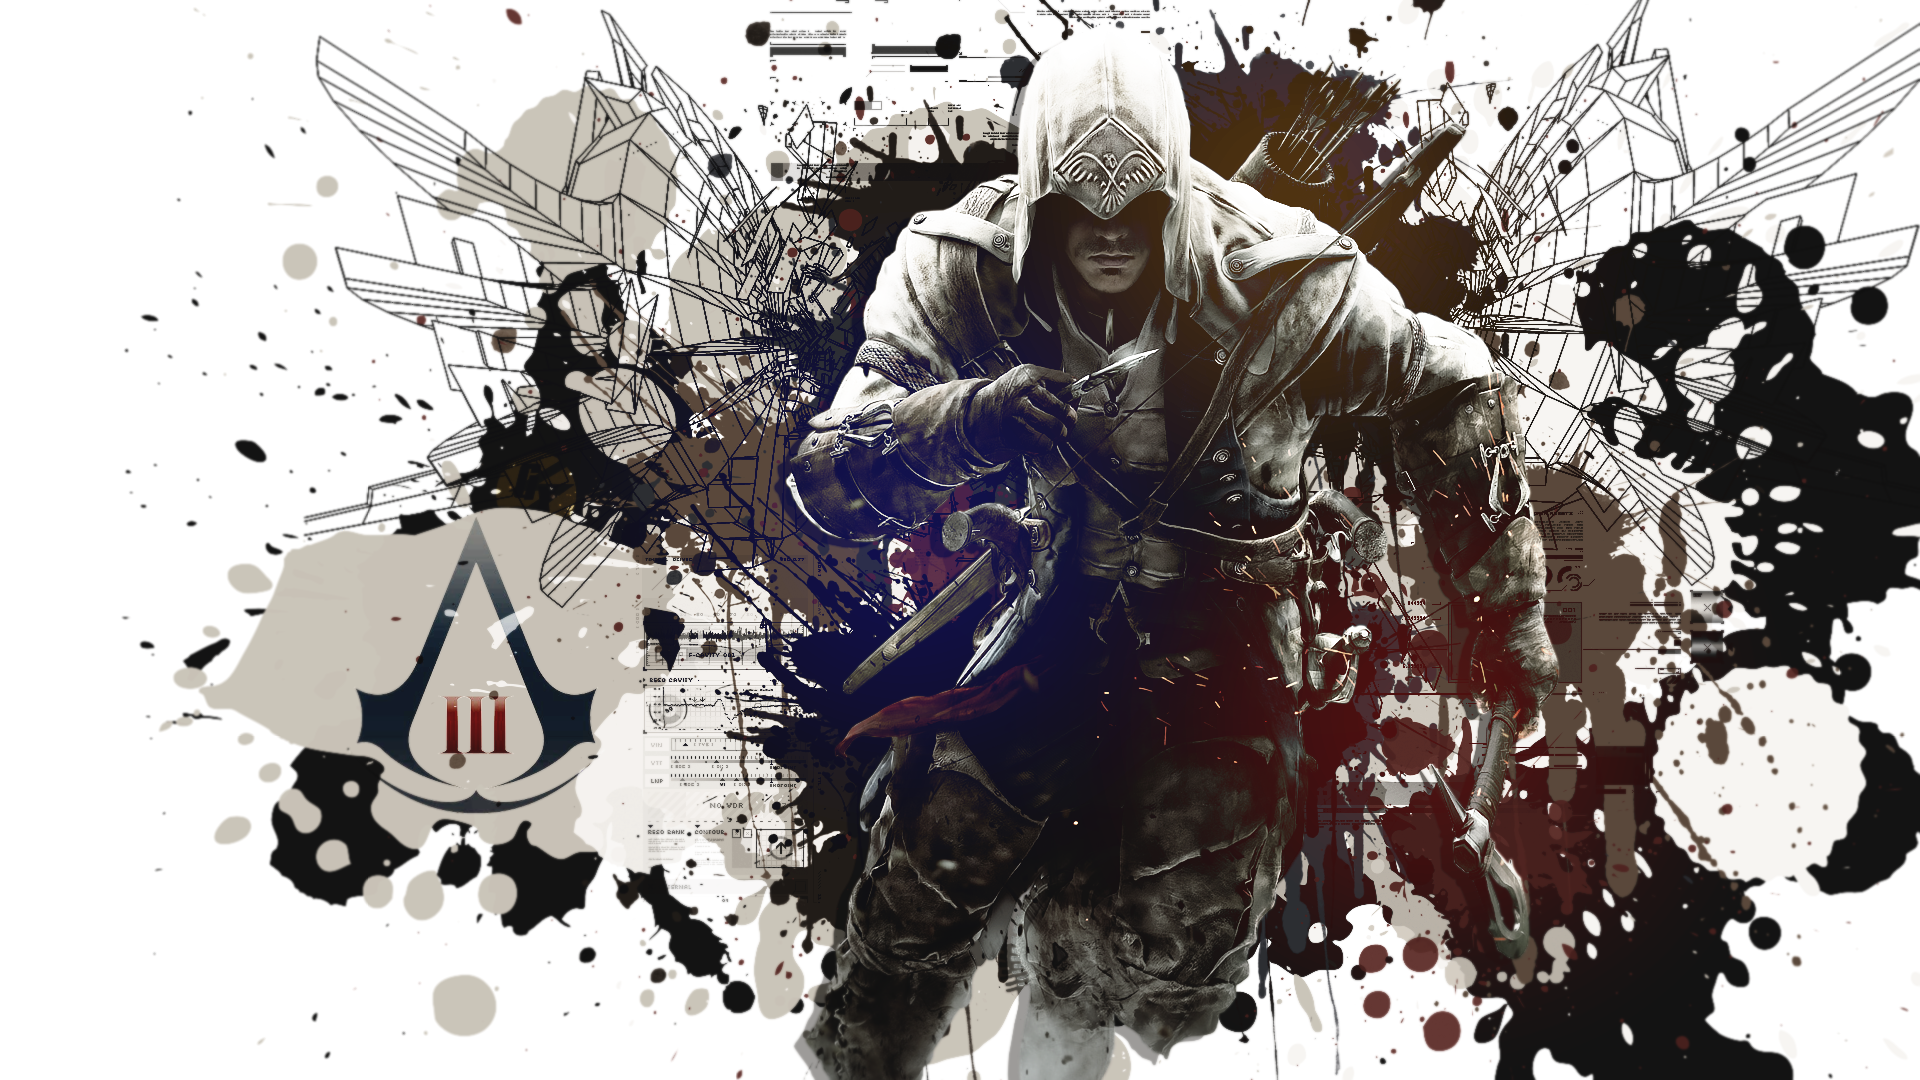 Assassins Creed 3 Wallpaper Hd 1080P wallpaper   1340750 1920x1080